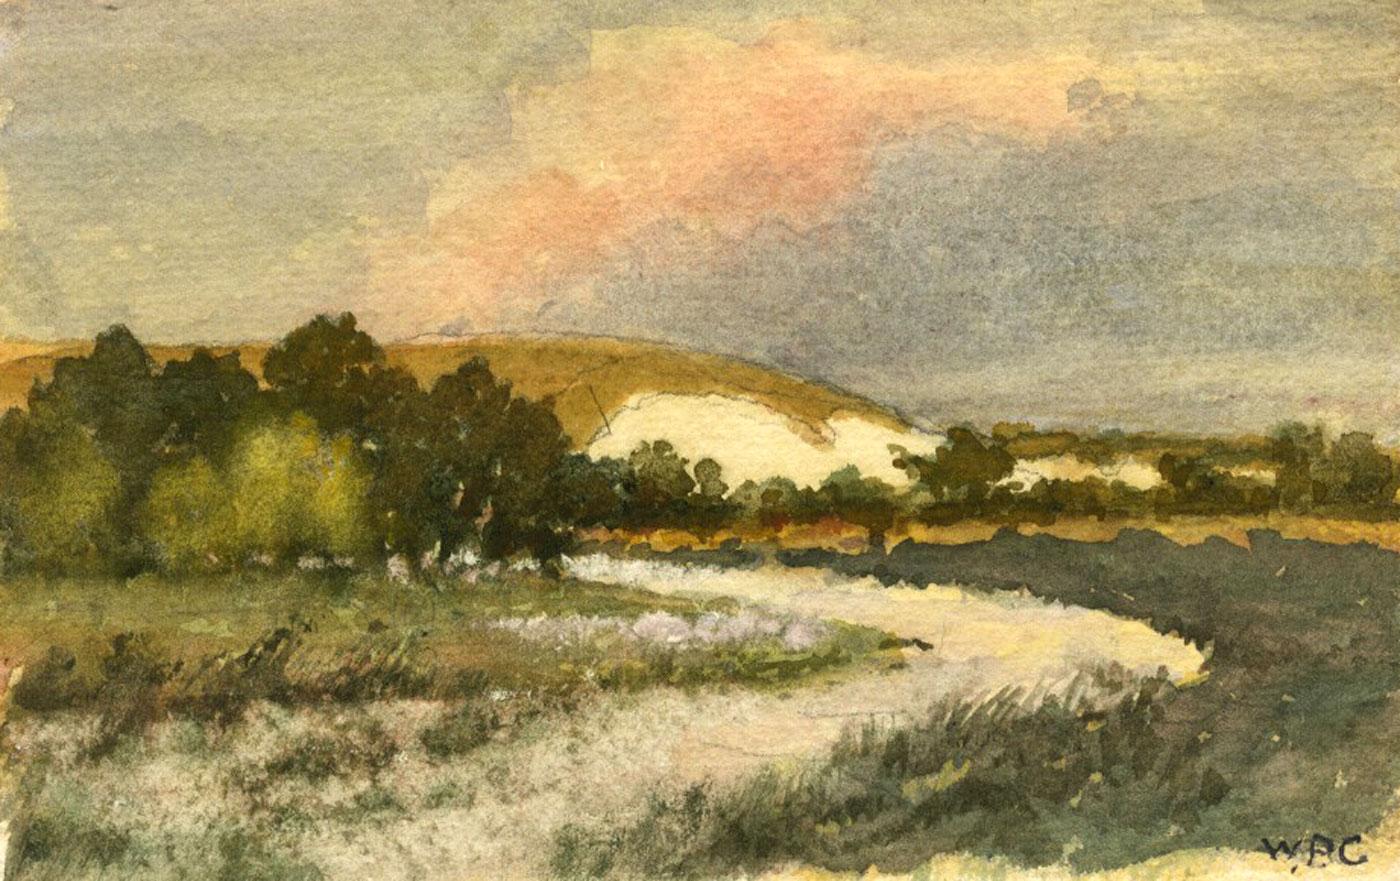 William Permeanus Cornish - Early 20th Century Watercolour, A Sussex Chalk Pit